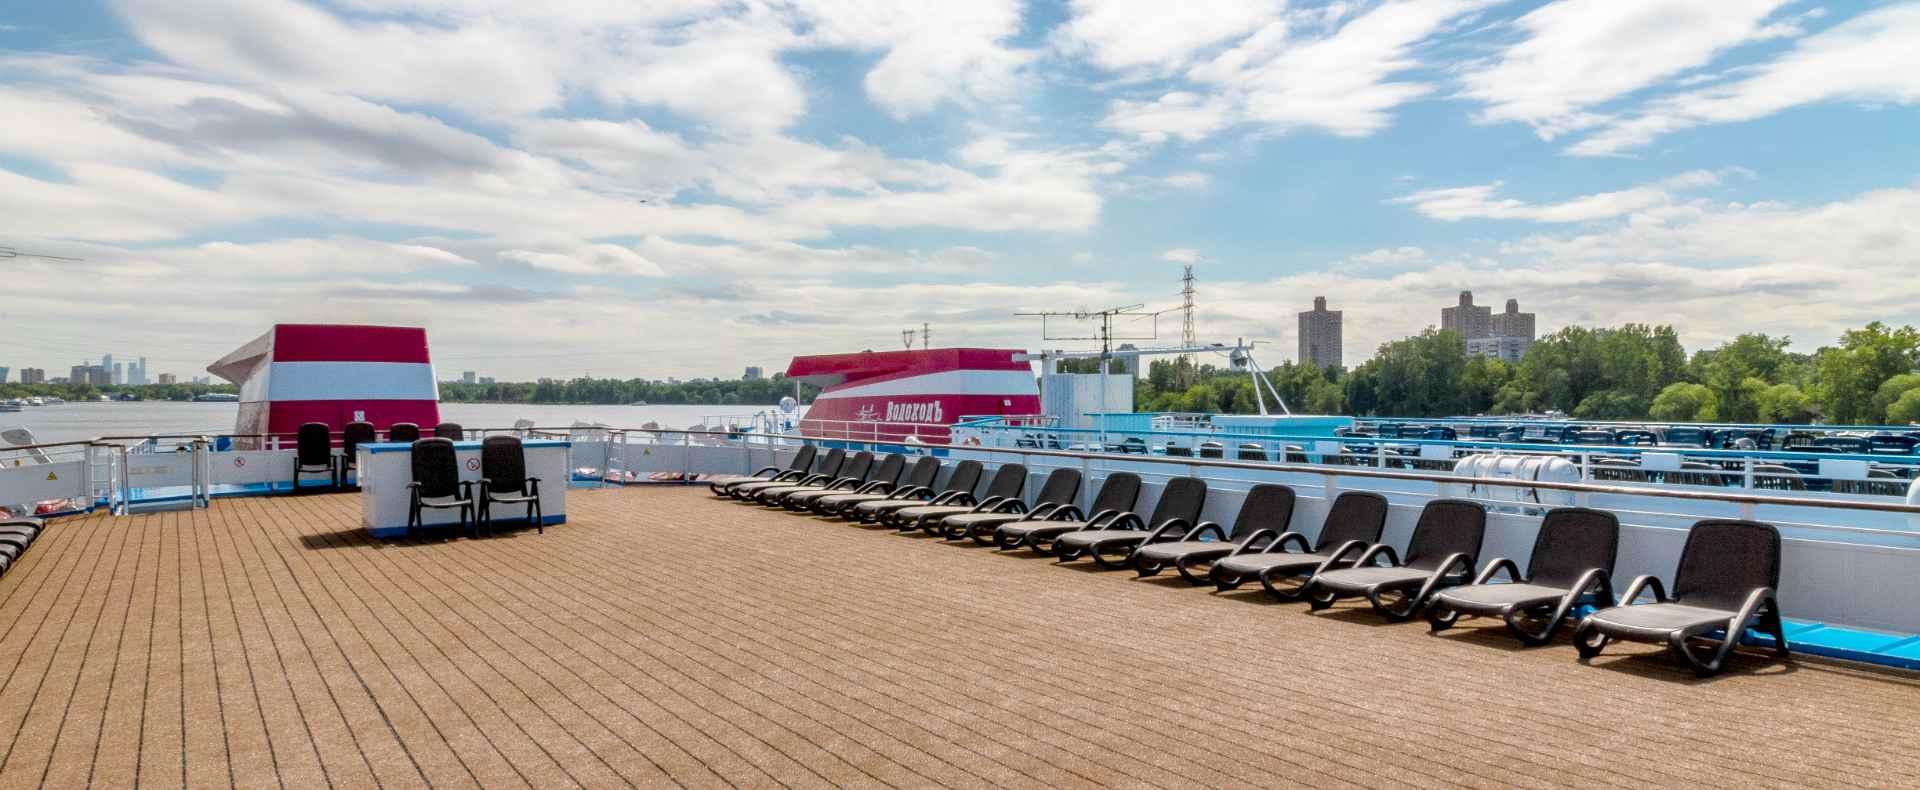 MS Chernishevsky Volga River Cruise